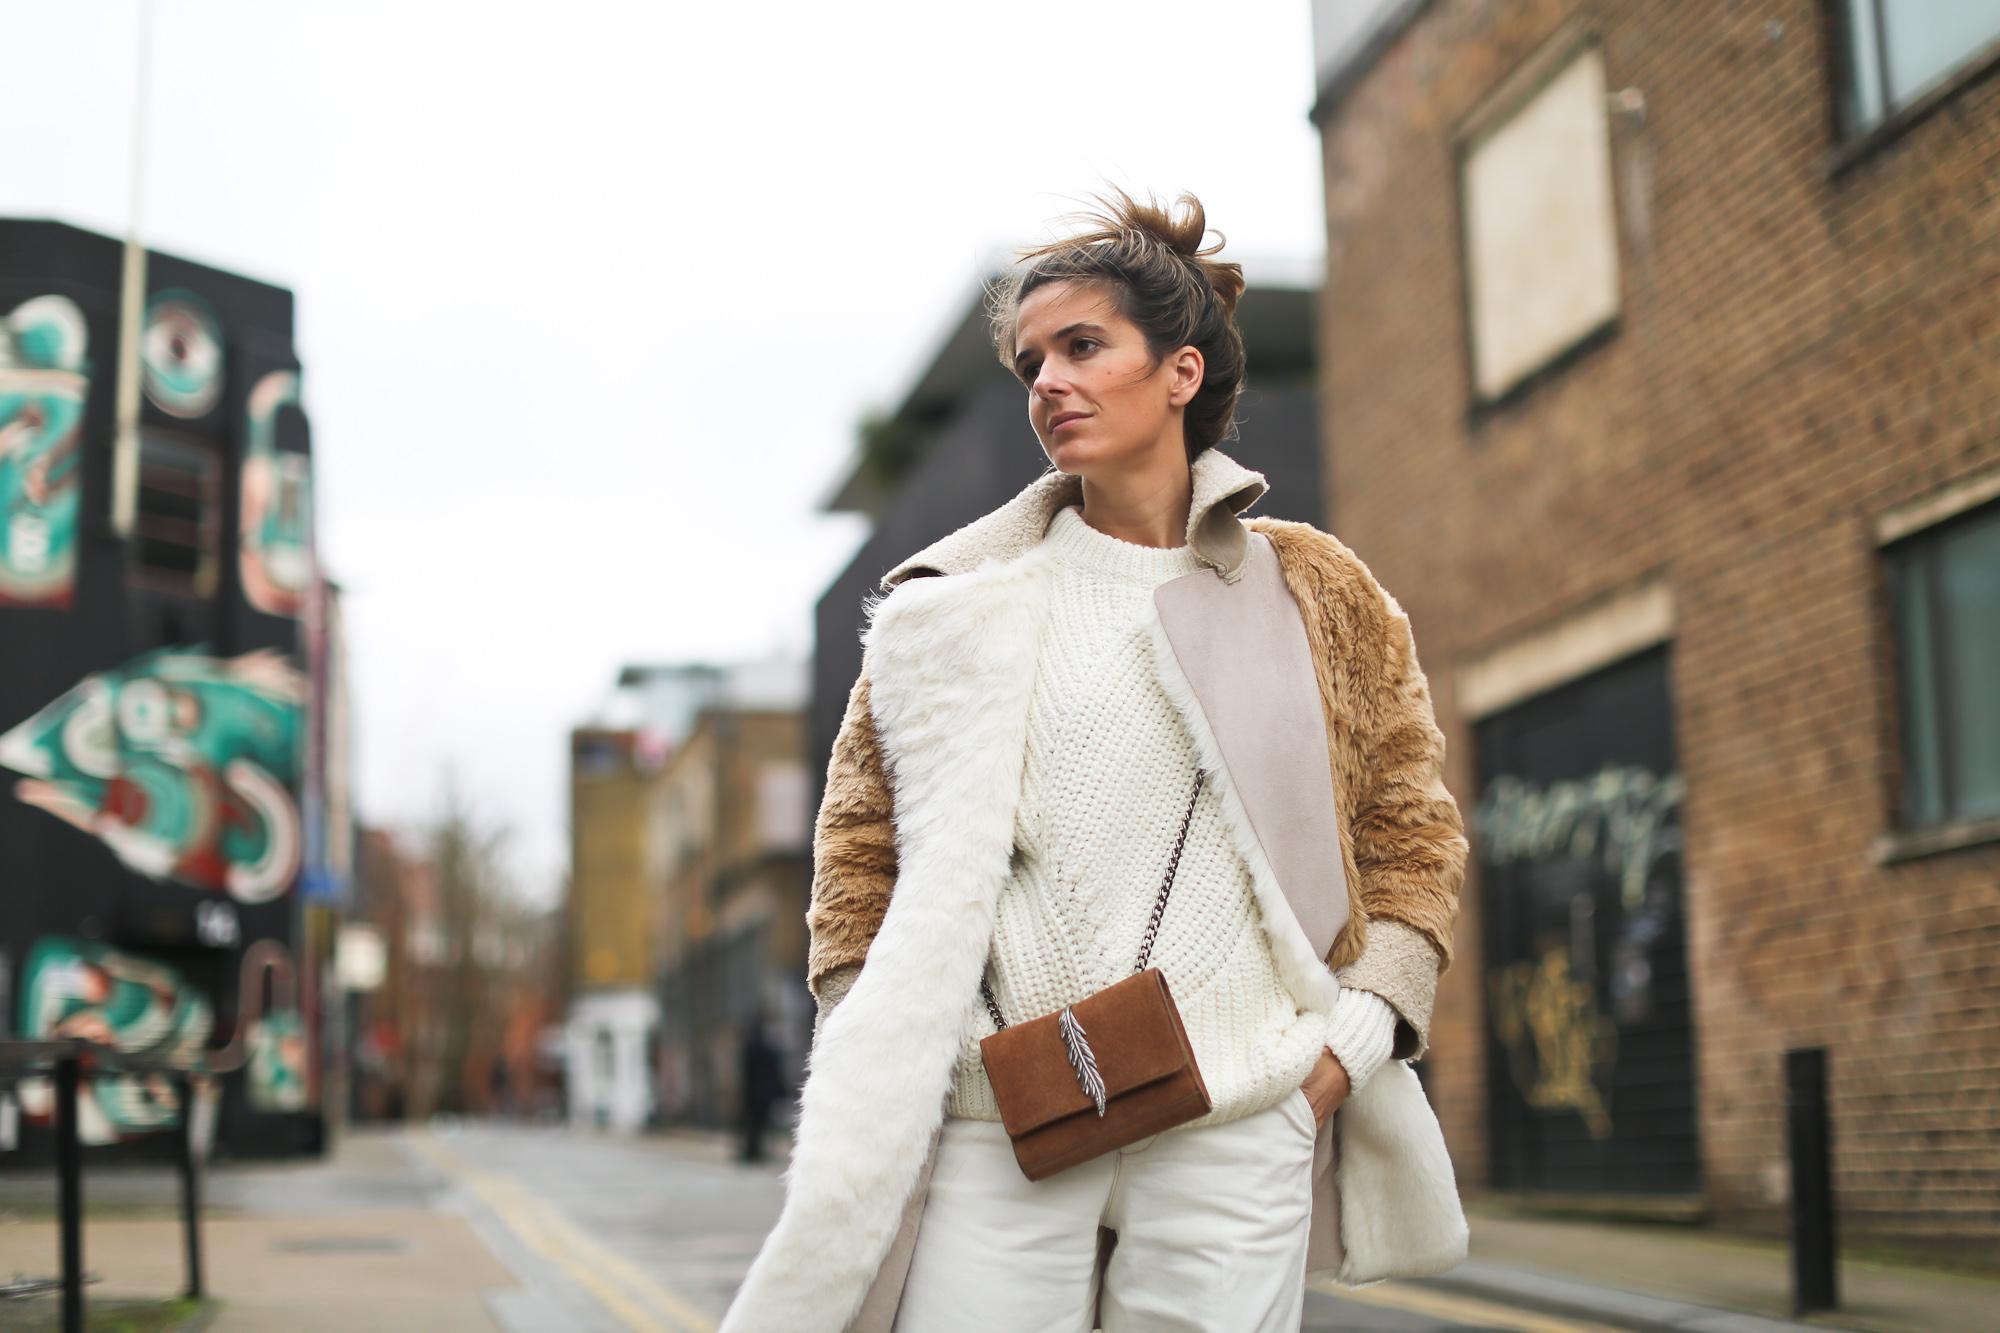 Clochet_streetstyle_asos_patchwork_faux_fur_coat_goldengoose_superstar_sneakers_topshopunique_show-8